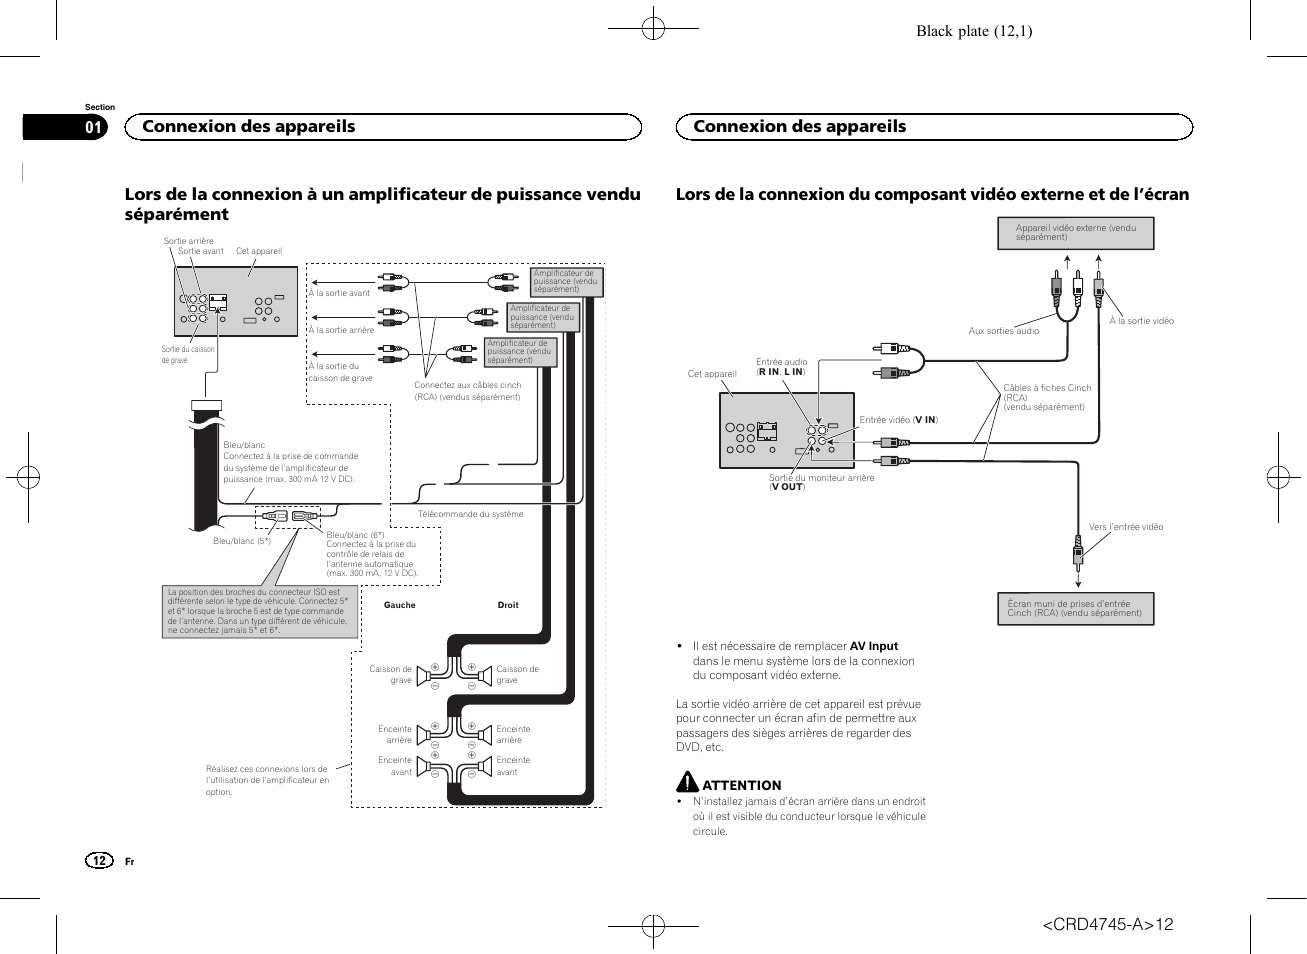 pioneer avh x5500bt page12?resize\=665%2C485 pioneer avh p3400bh wiring diagram pioneer wiring diagrams pioneer avh p2300dvd wiring diagram at cos-gaming.co